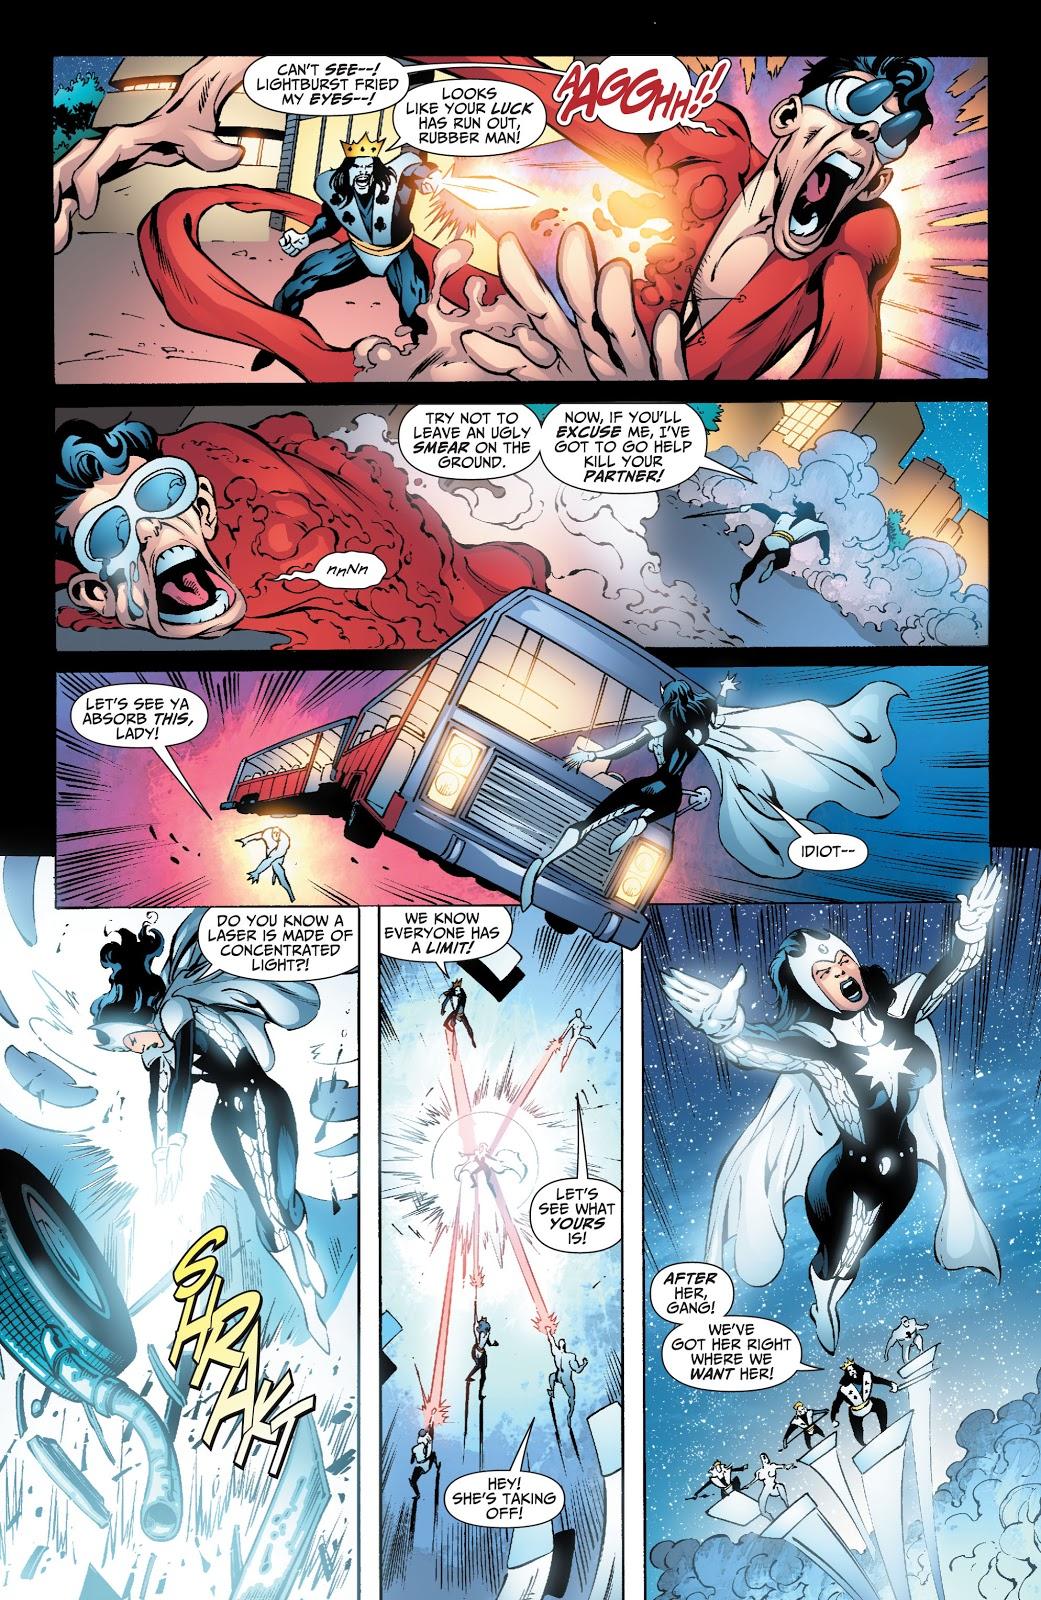 Doctor Light And Plastic Man VS Royal Flush Gang